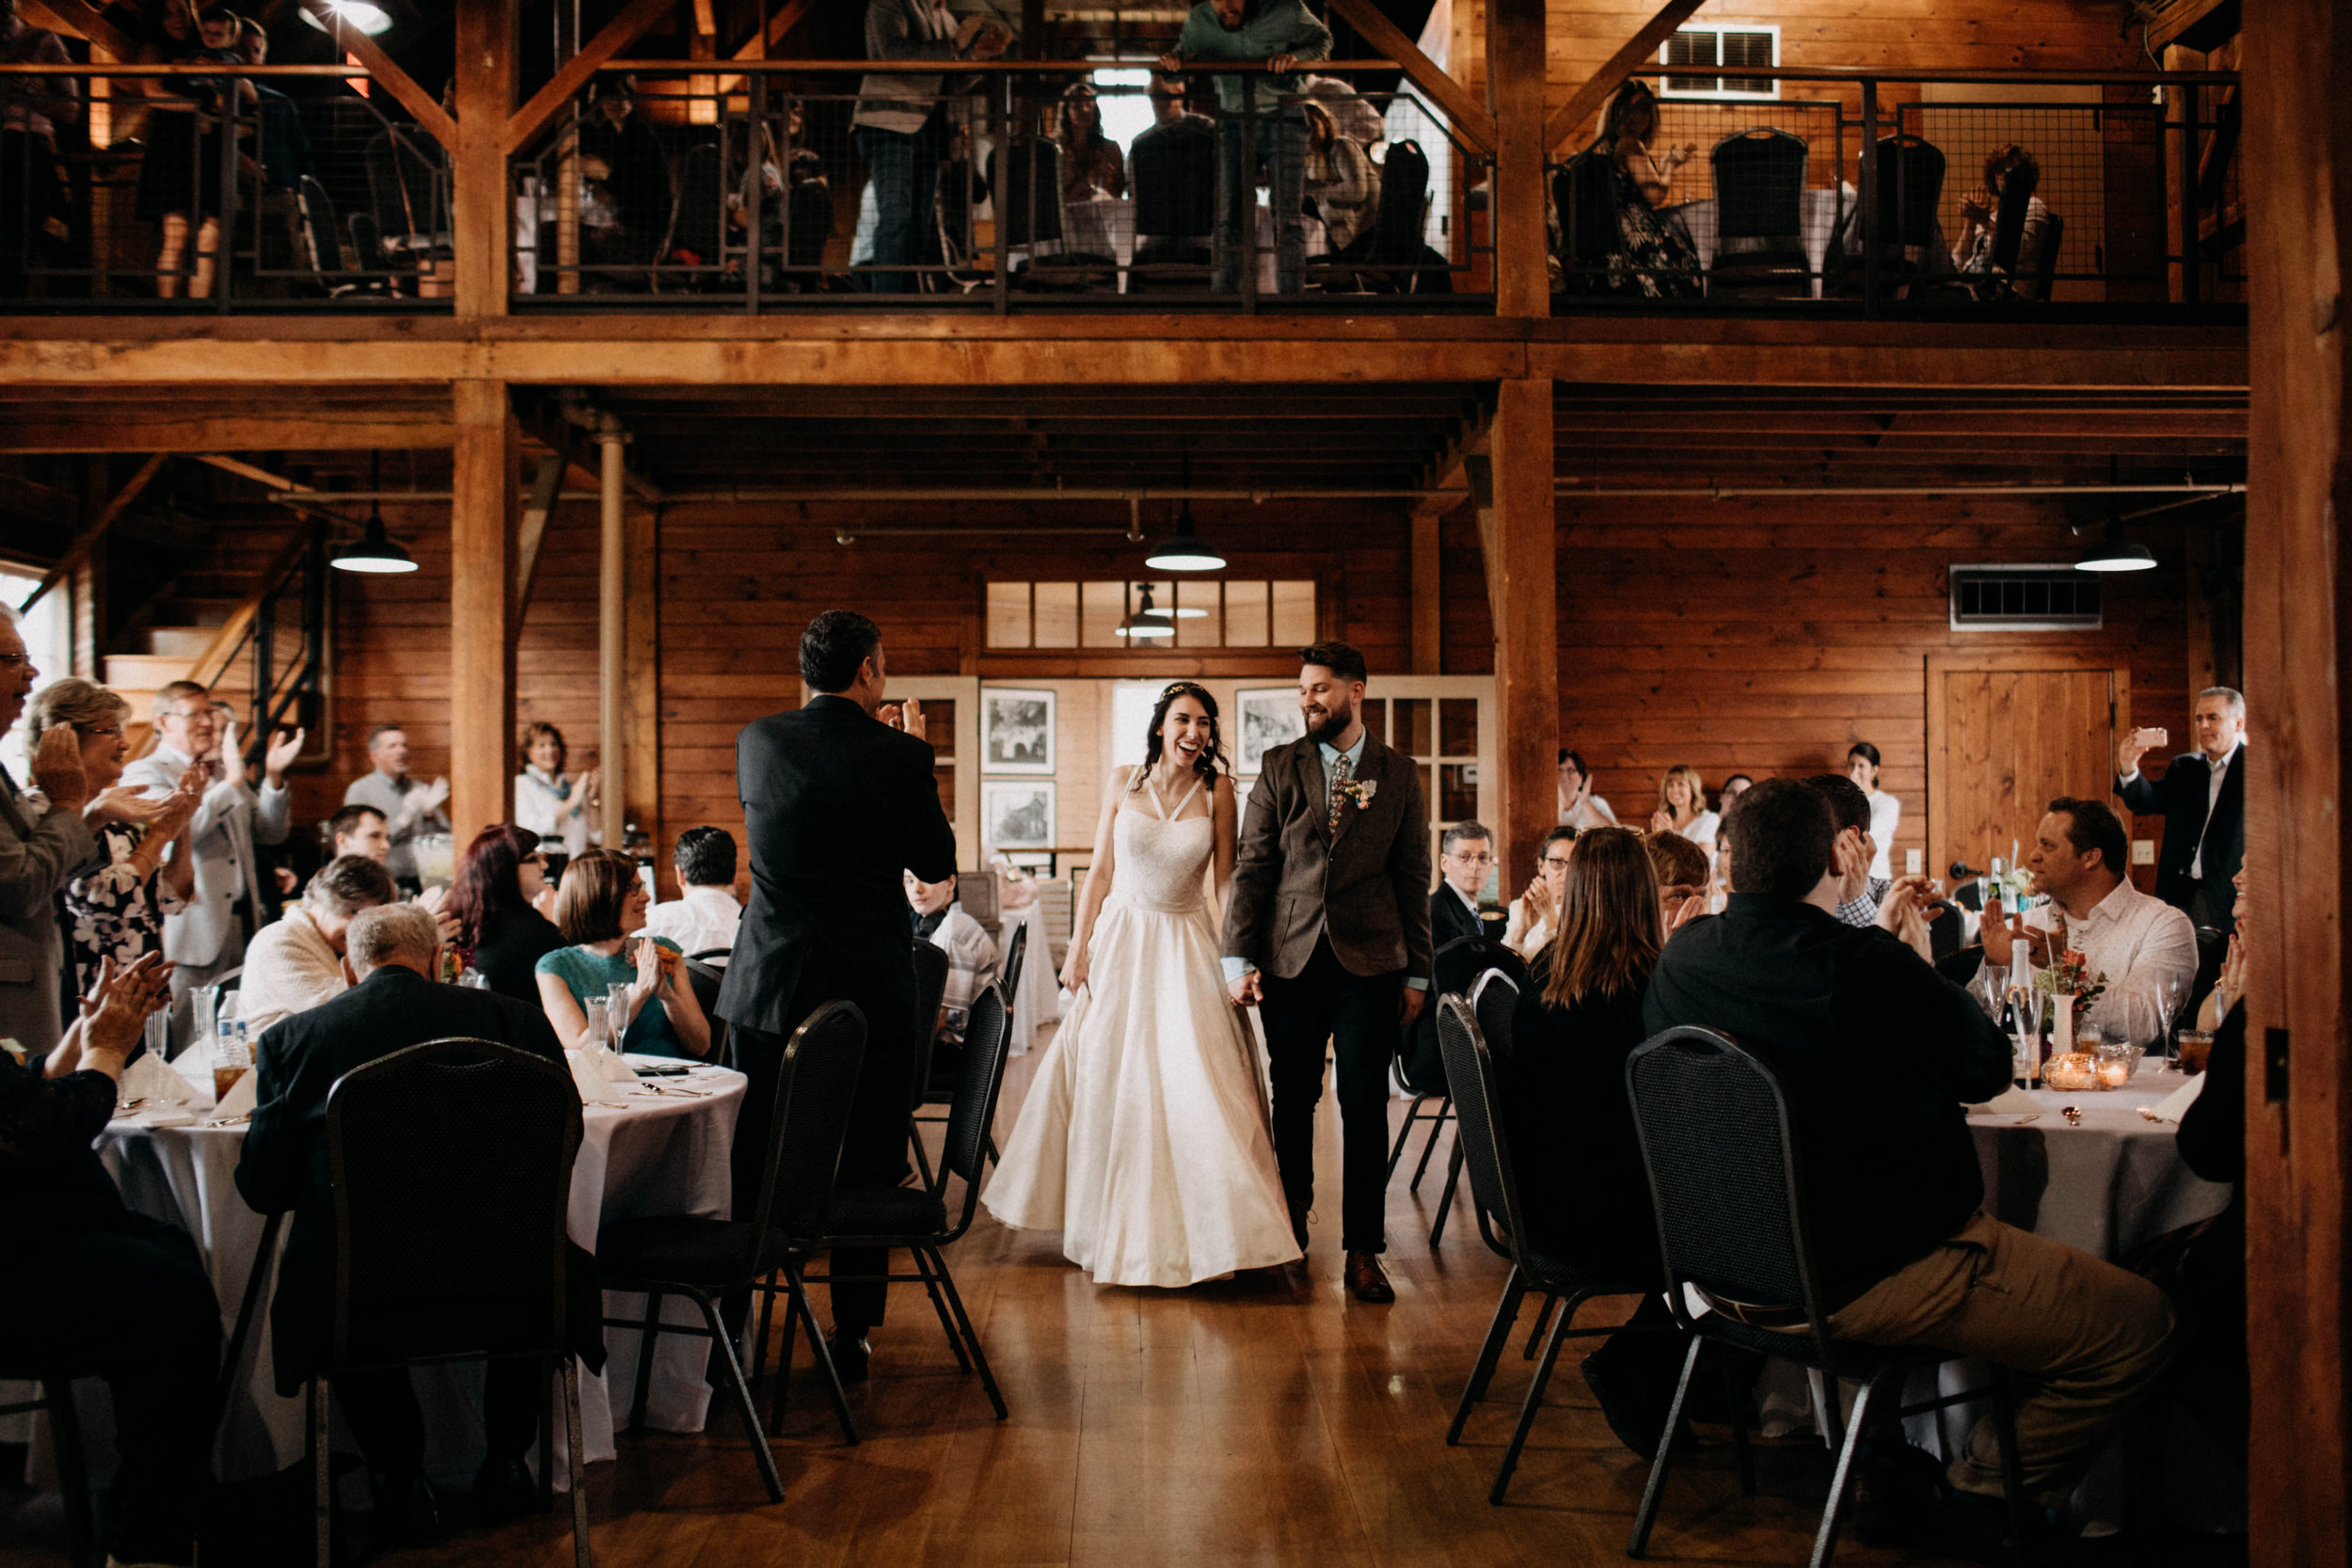 Columbus, Ohio Wedding Photographer Everal Barn At Heritage Park Wedding Venue Grace E Jones Photography245.jpg